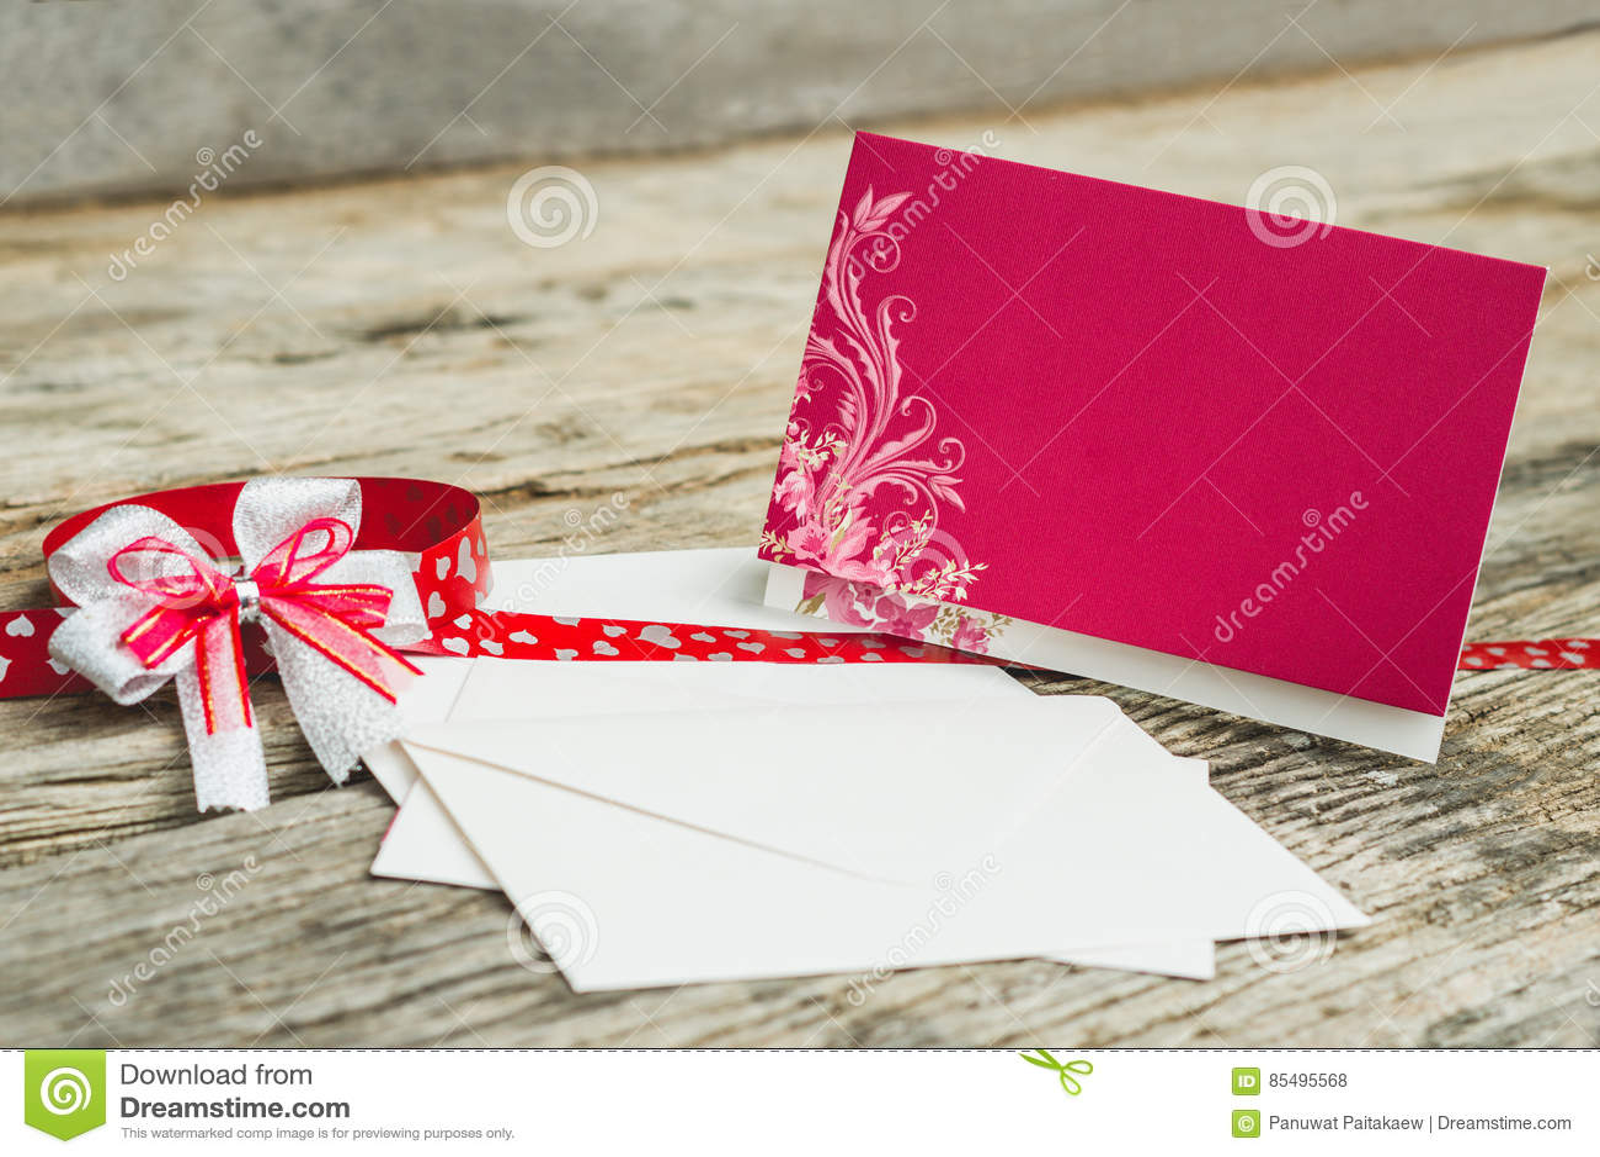 Wedding Invitation card stock photo. Image of invitation - 85495568